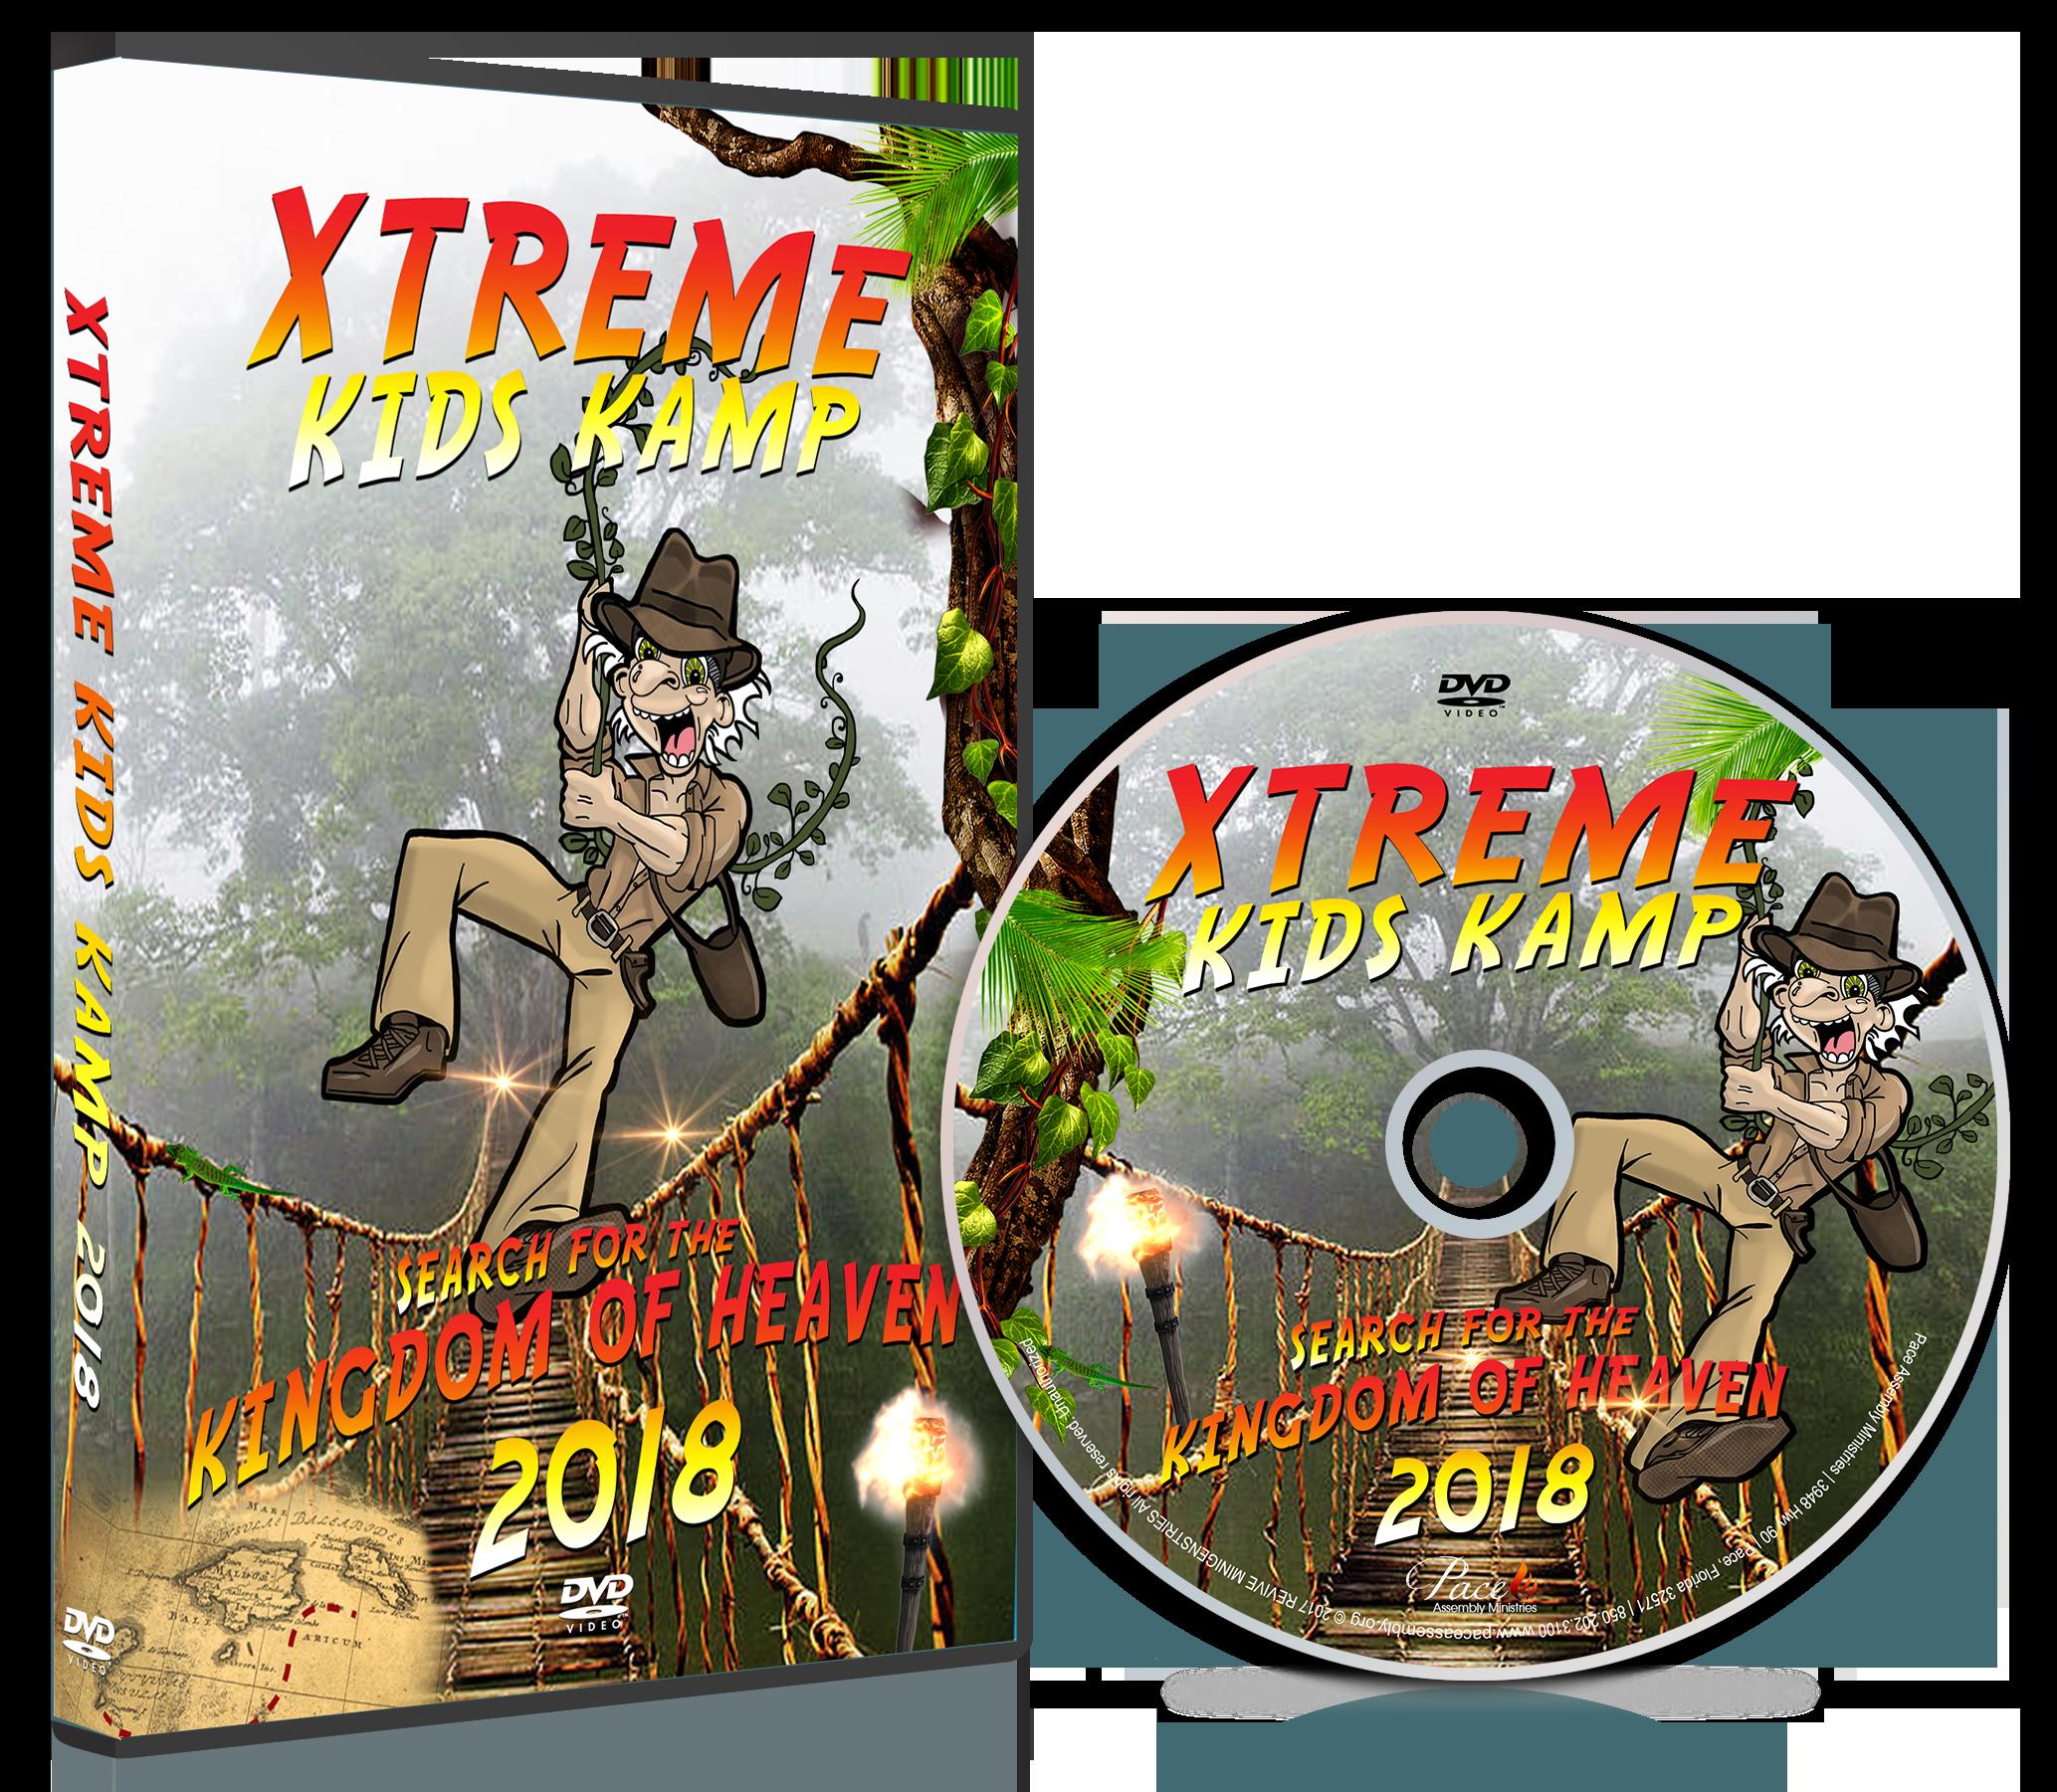 Xtreme Kids Kamp 2018